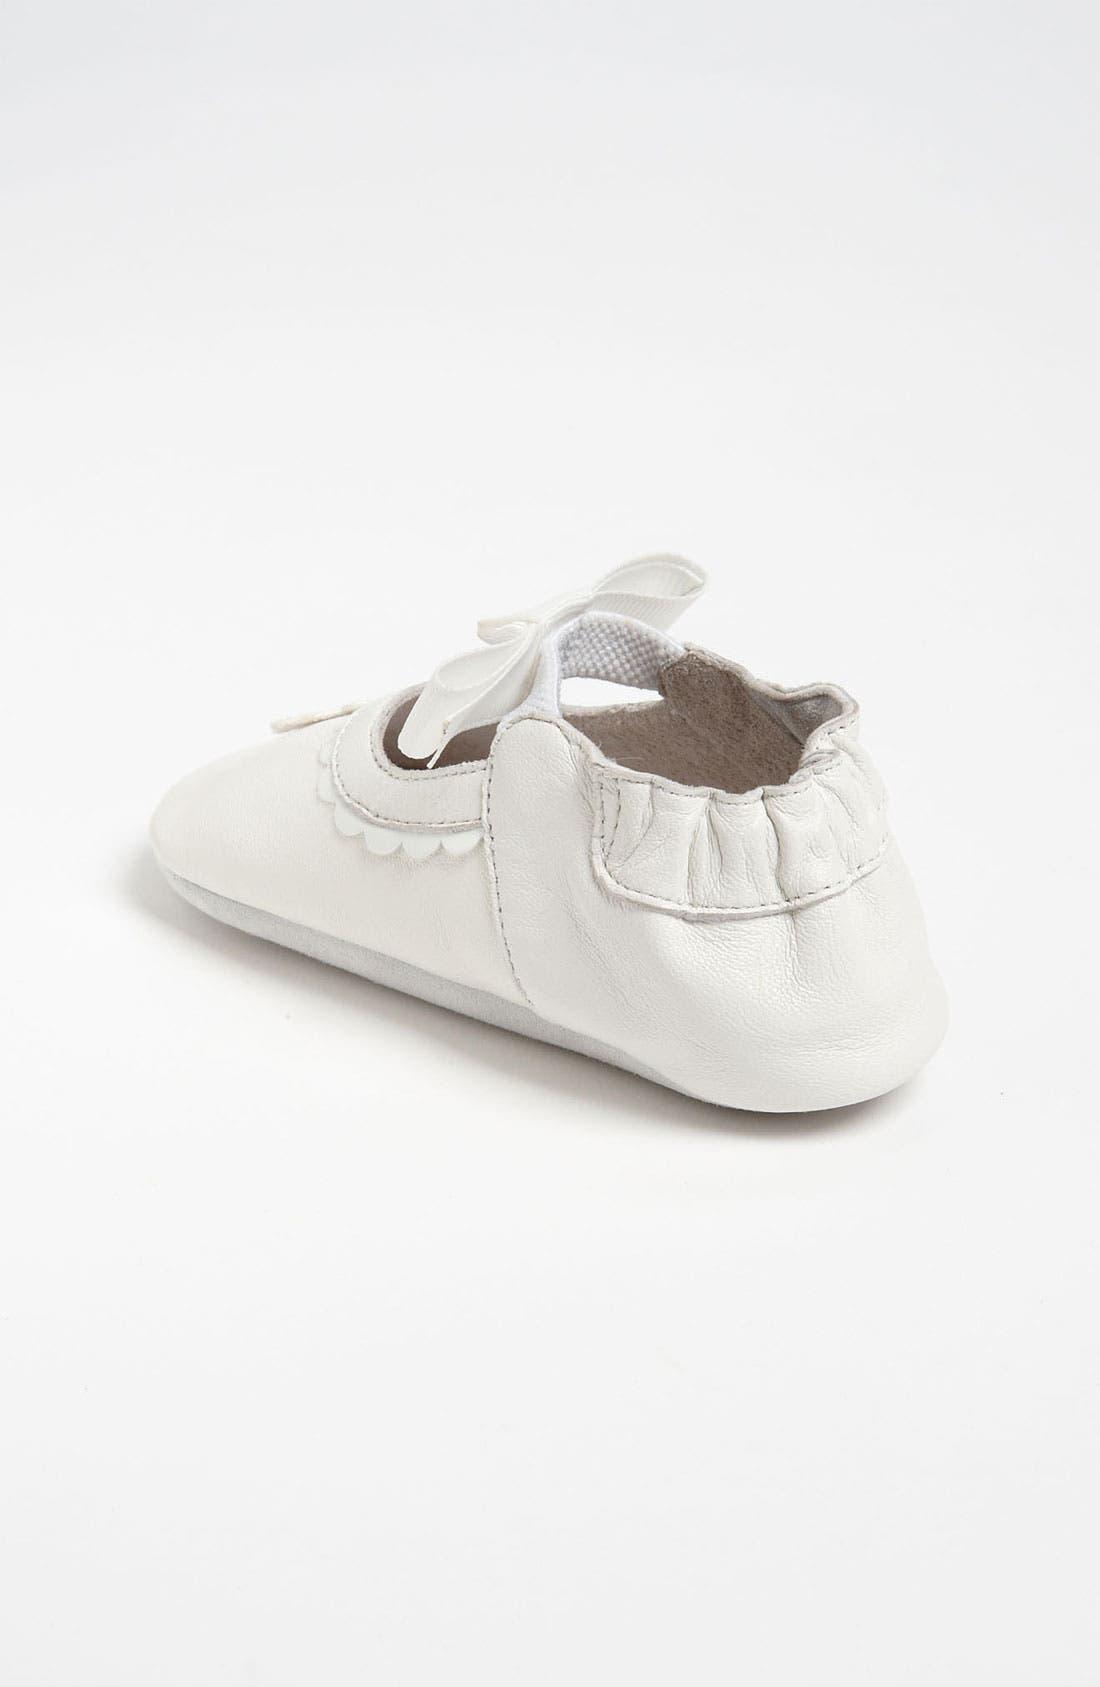 Alternate Image 2  - Nordstrom Baby 'Daisy' Crib Shoe (Infant)